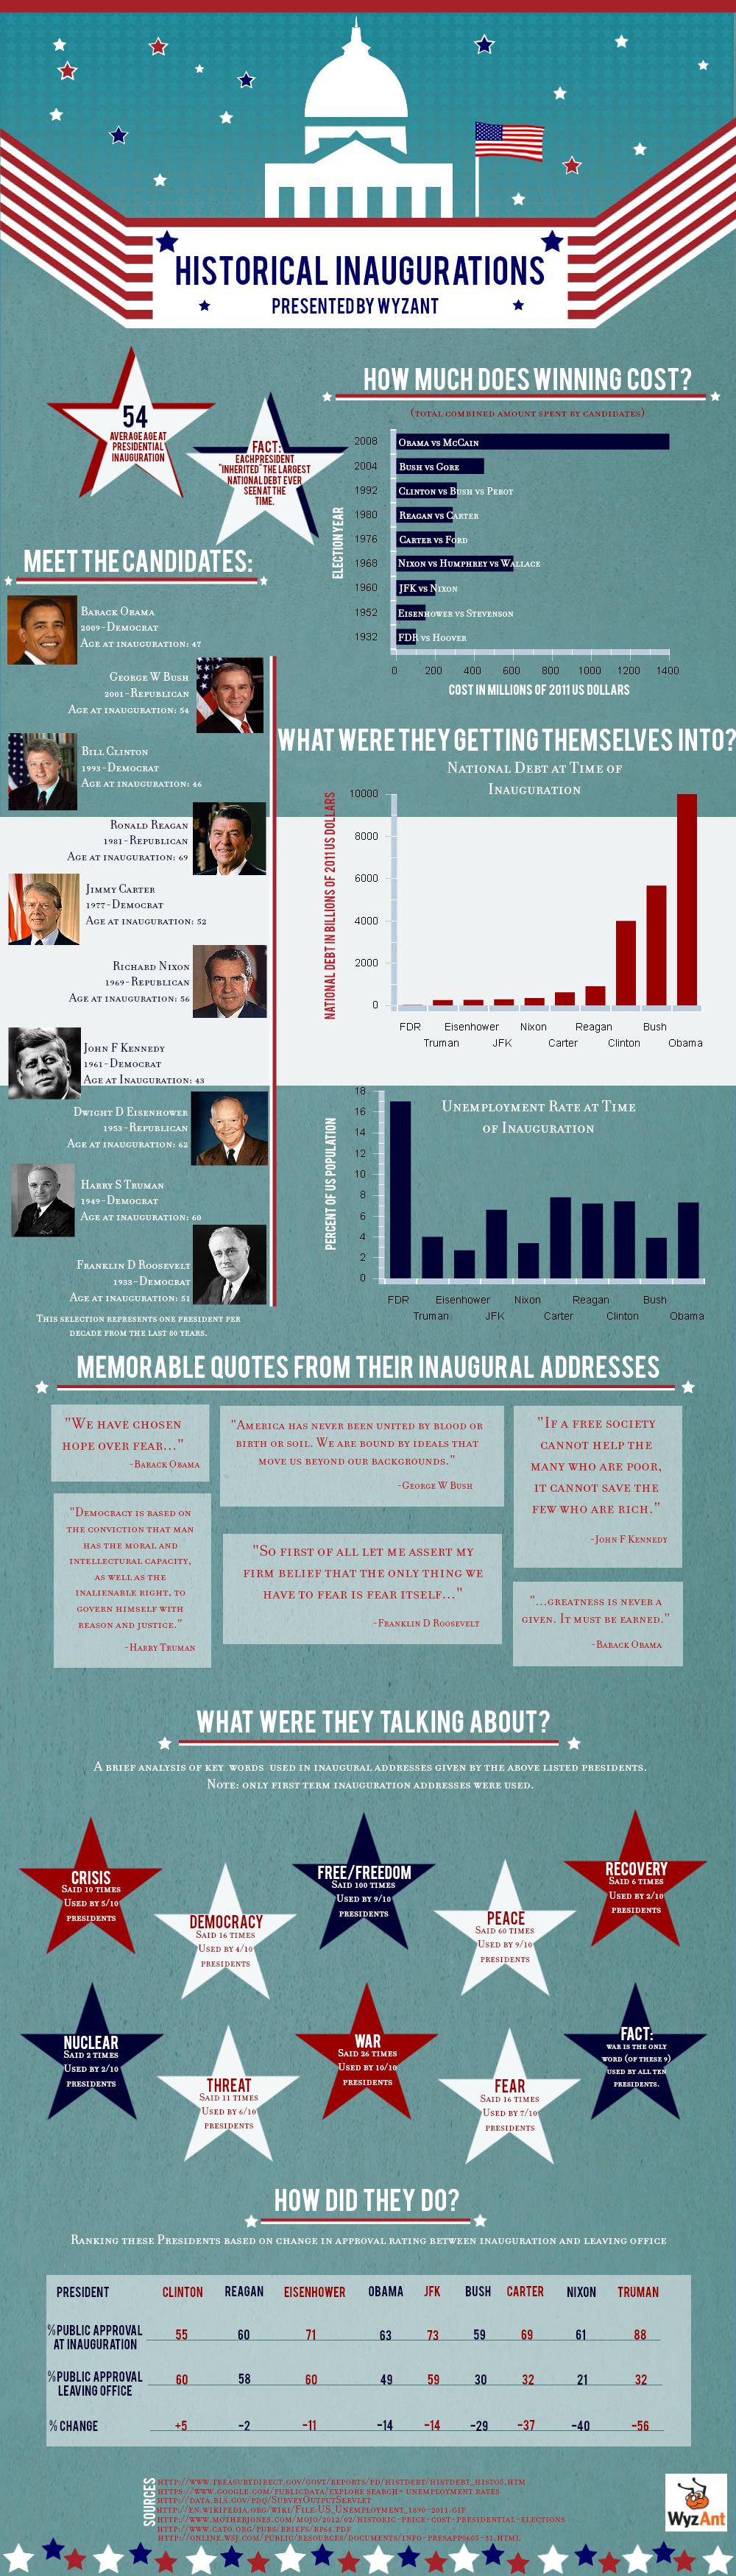 History of Inaugurations